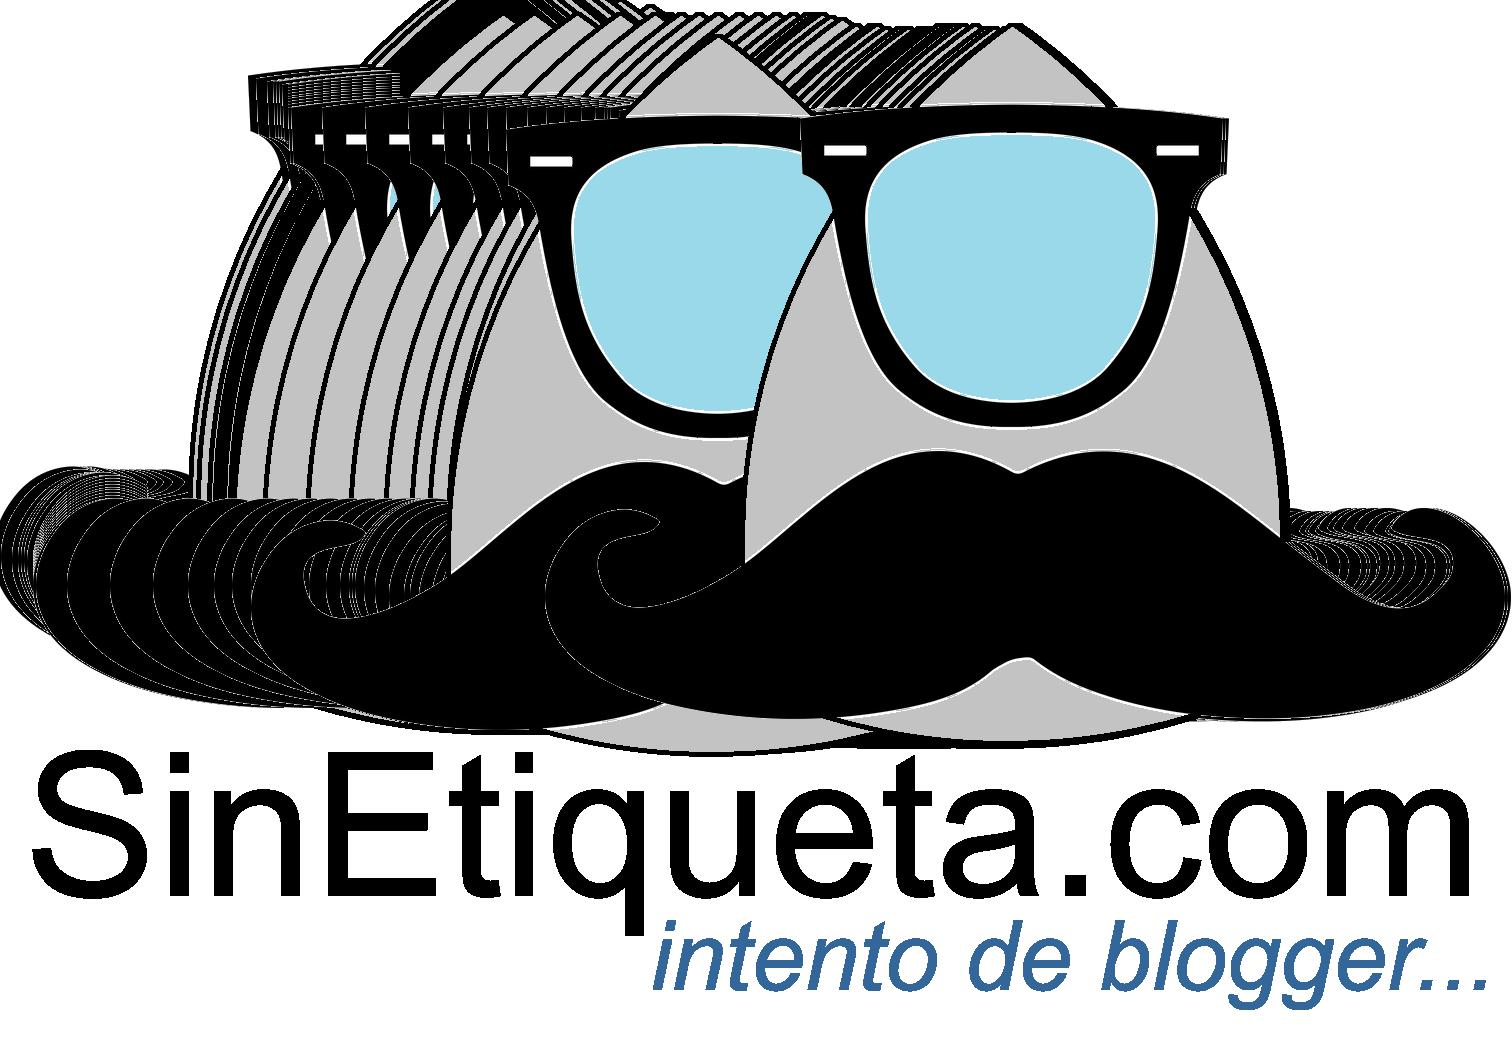 SinEtiqueta.com